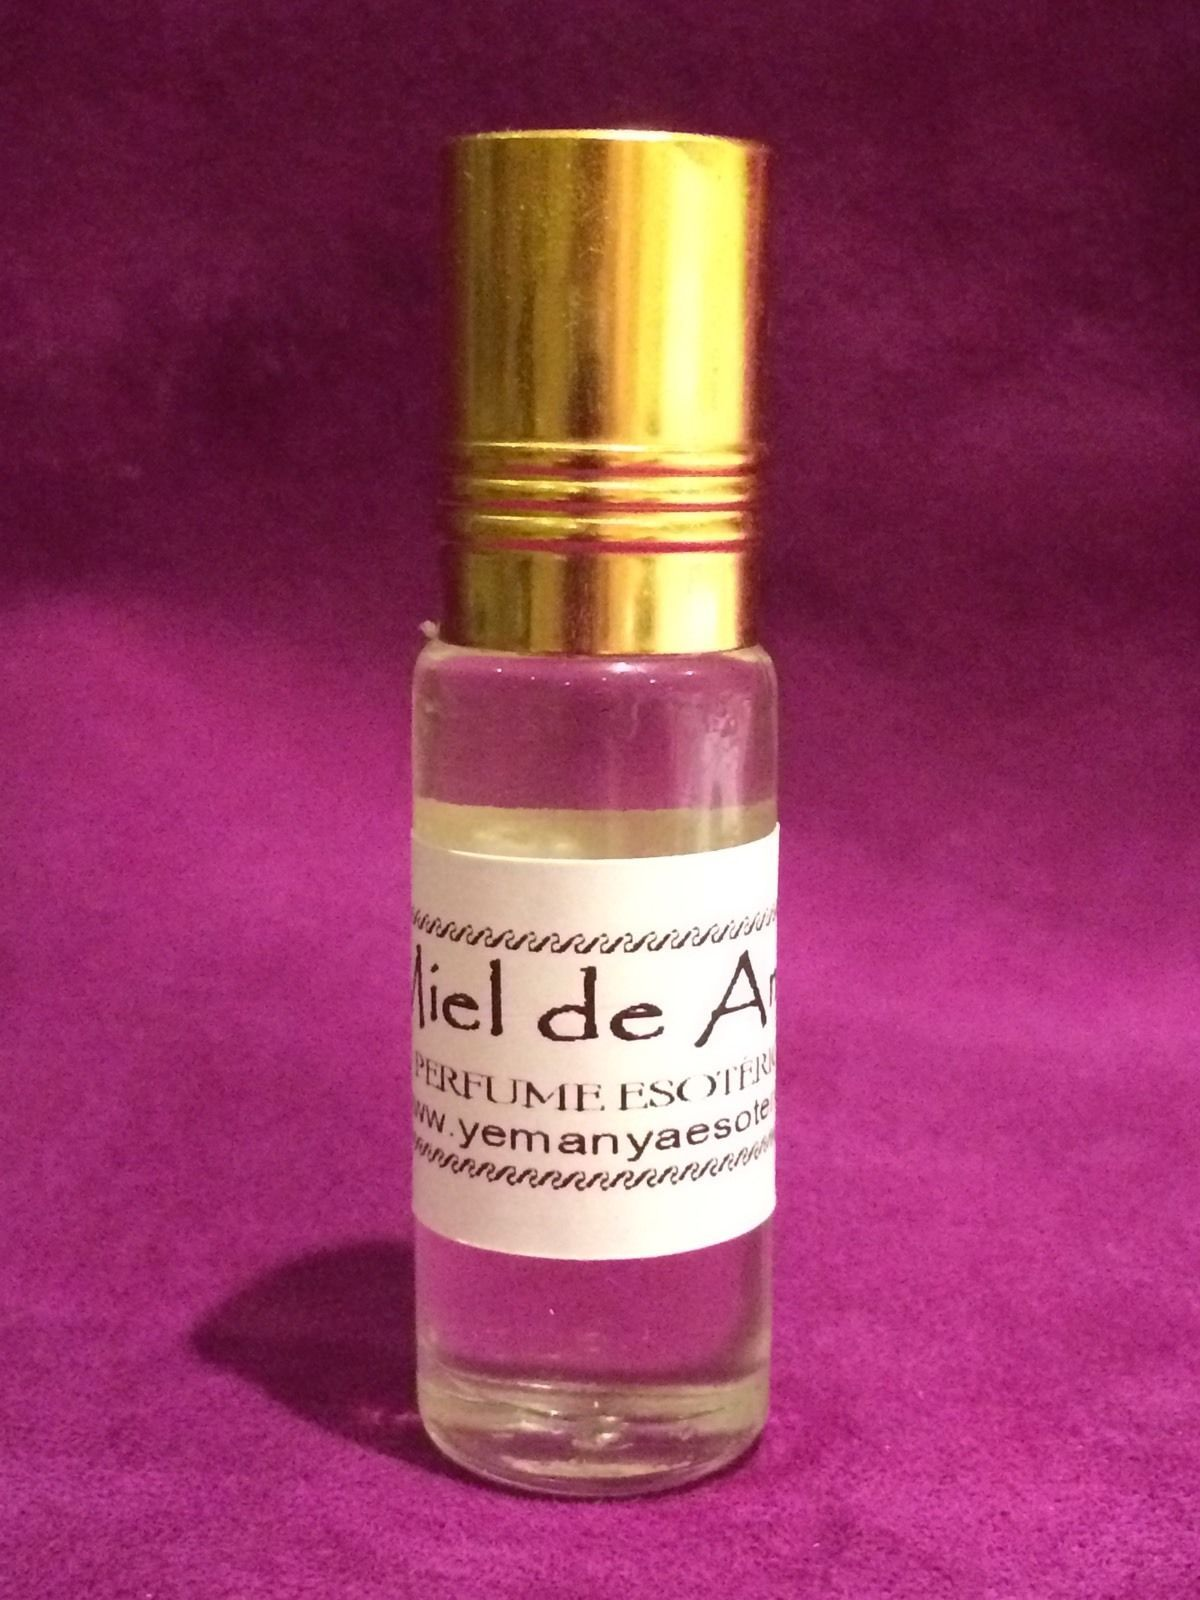 PERFUME ESOTERICO MIEL DE AMOR 5 ml